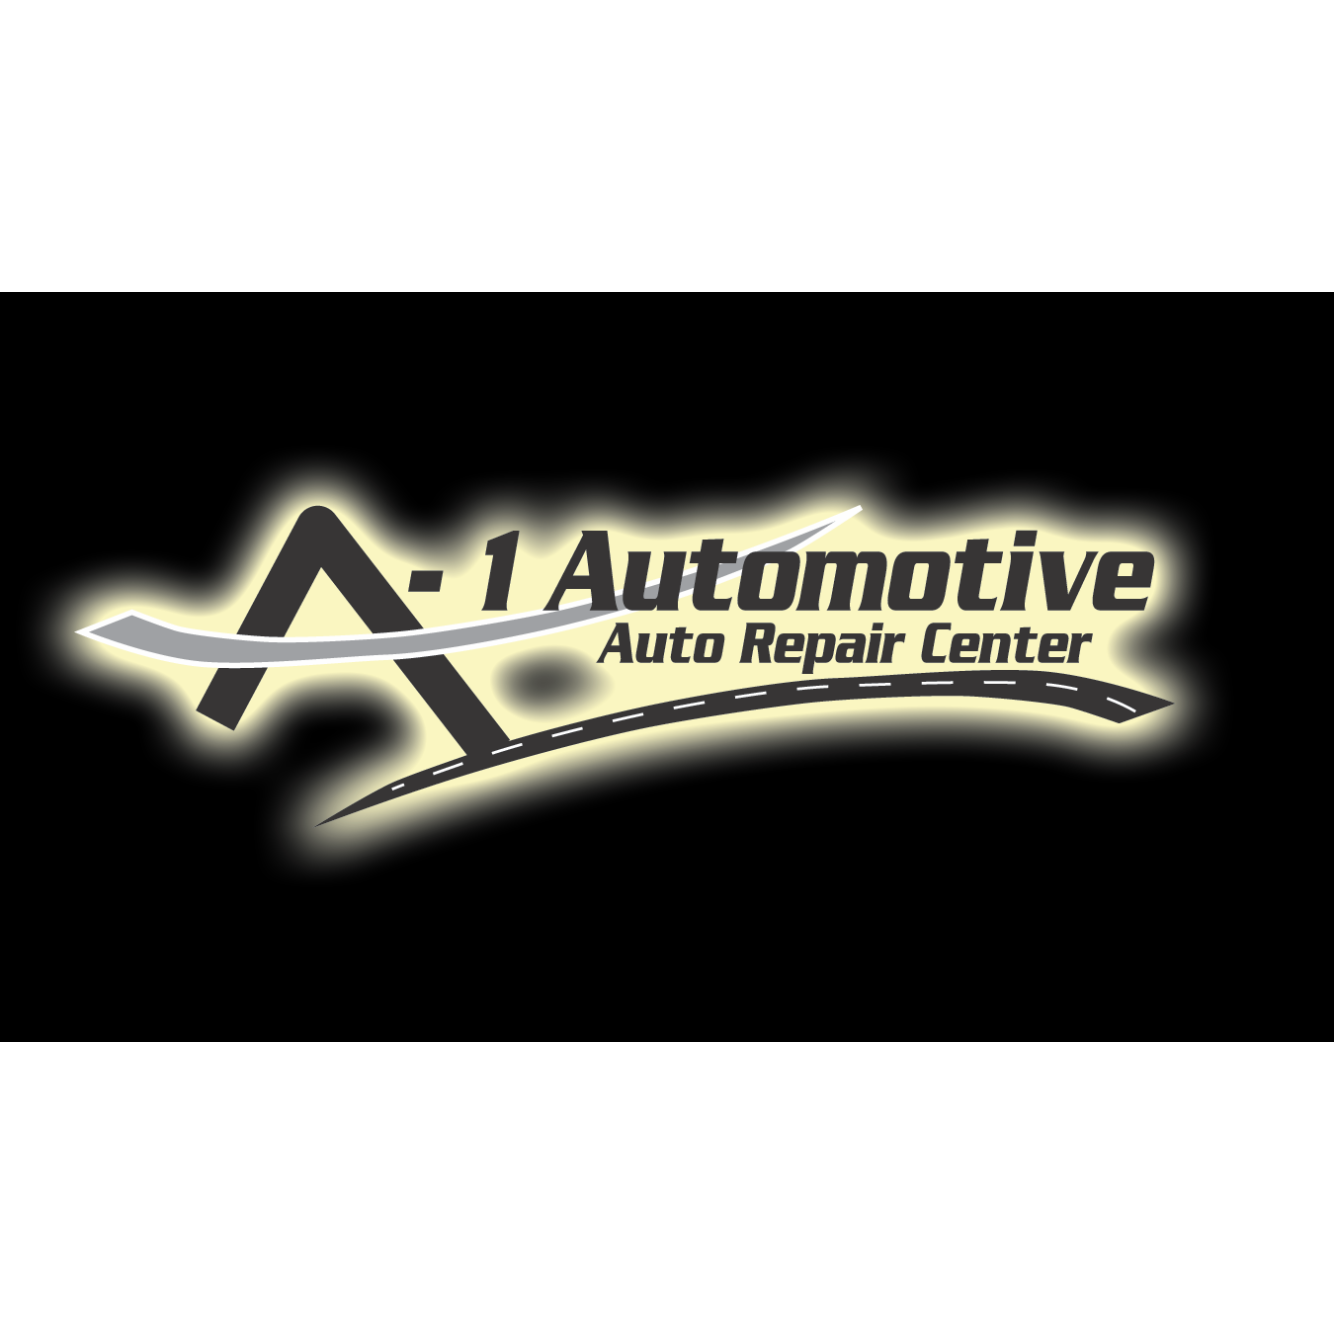 A1 Automotive Auto Repair Center